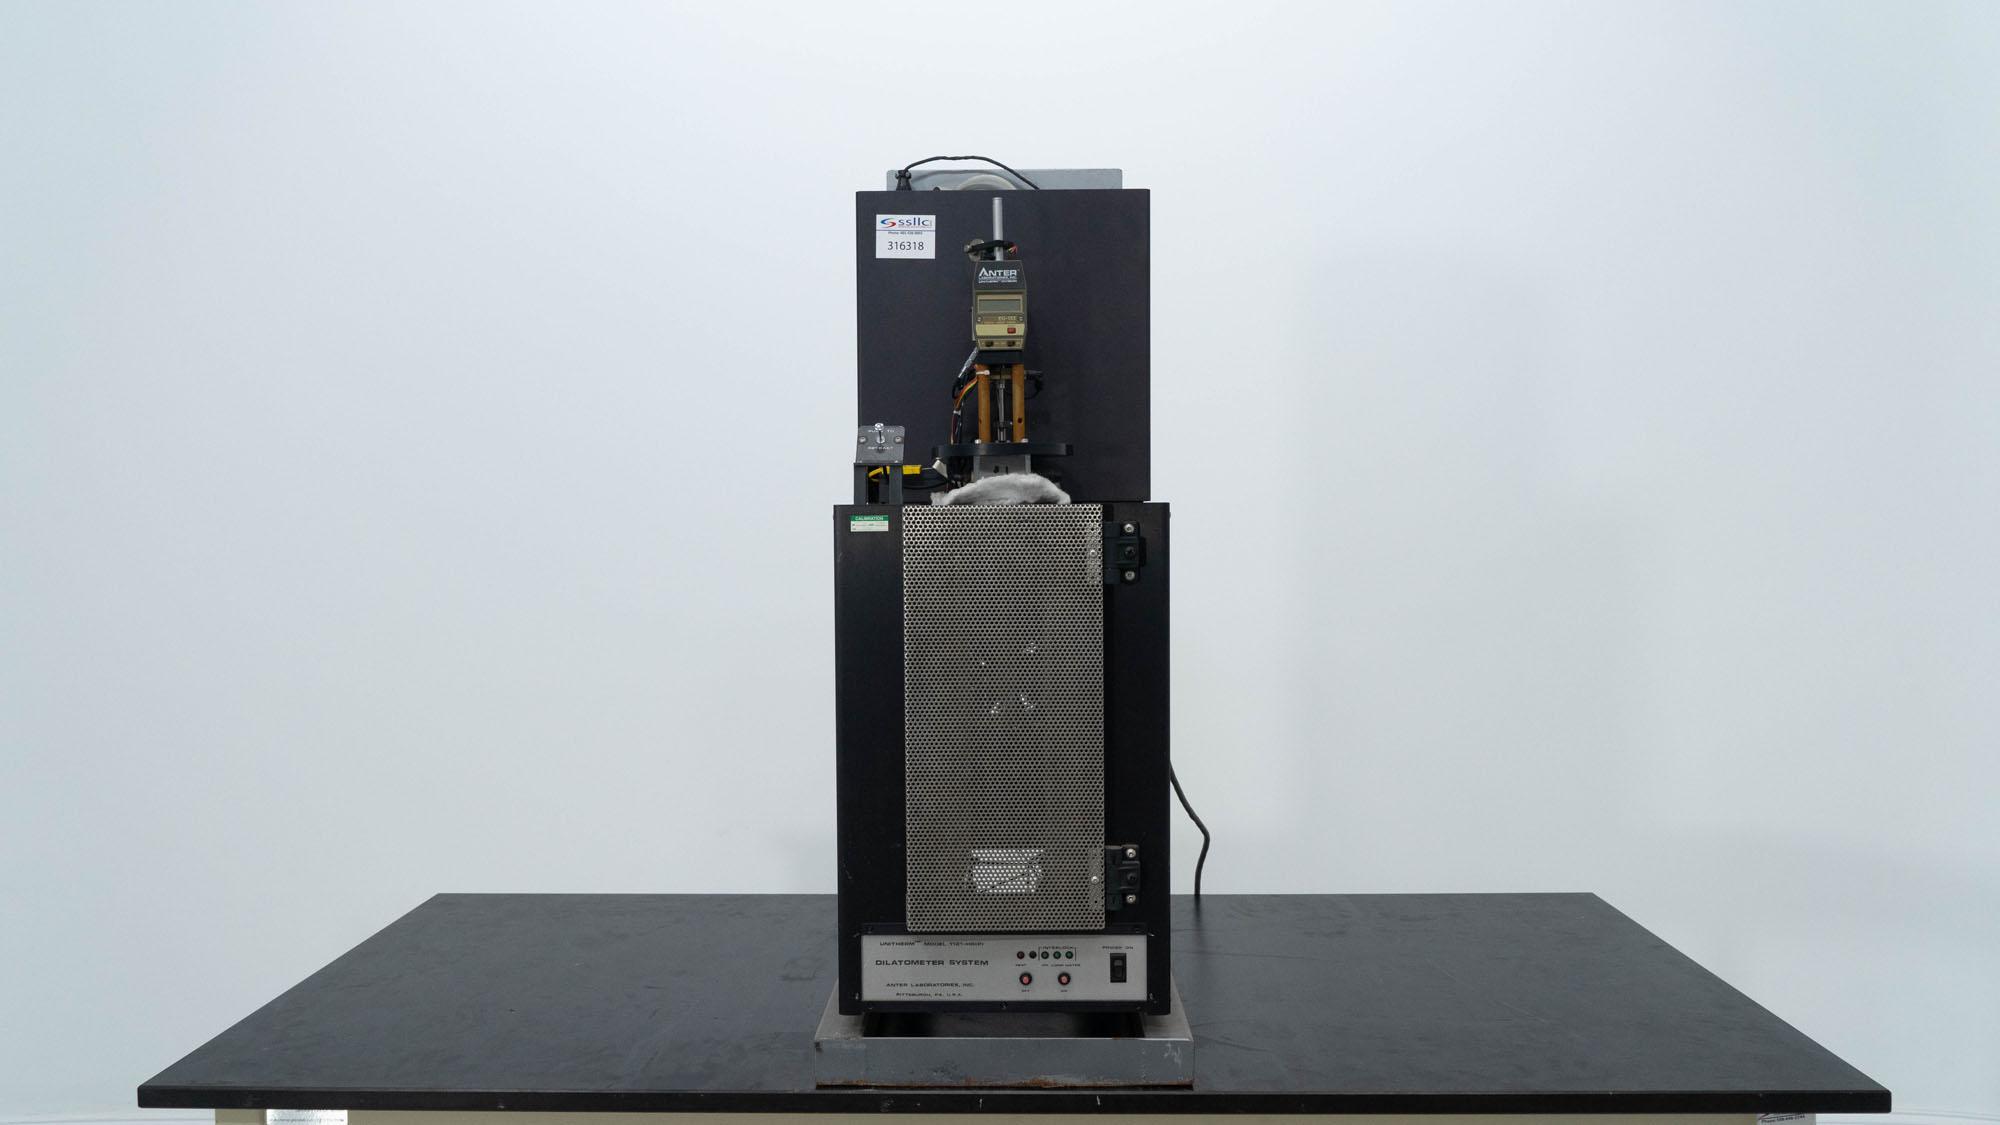 Anter lab Unitherm Dilatometer, Model 1121-HRP